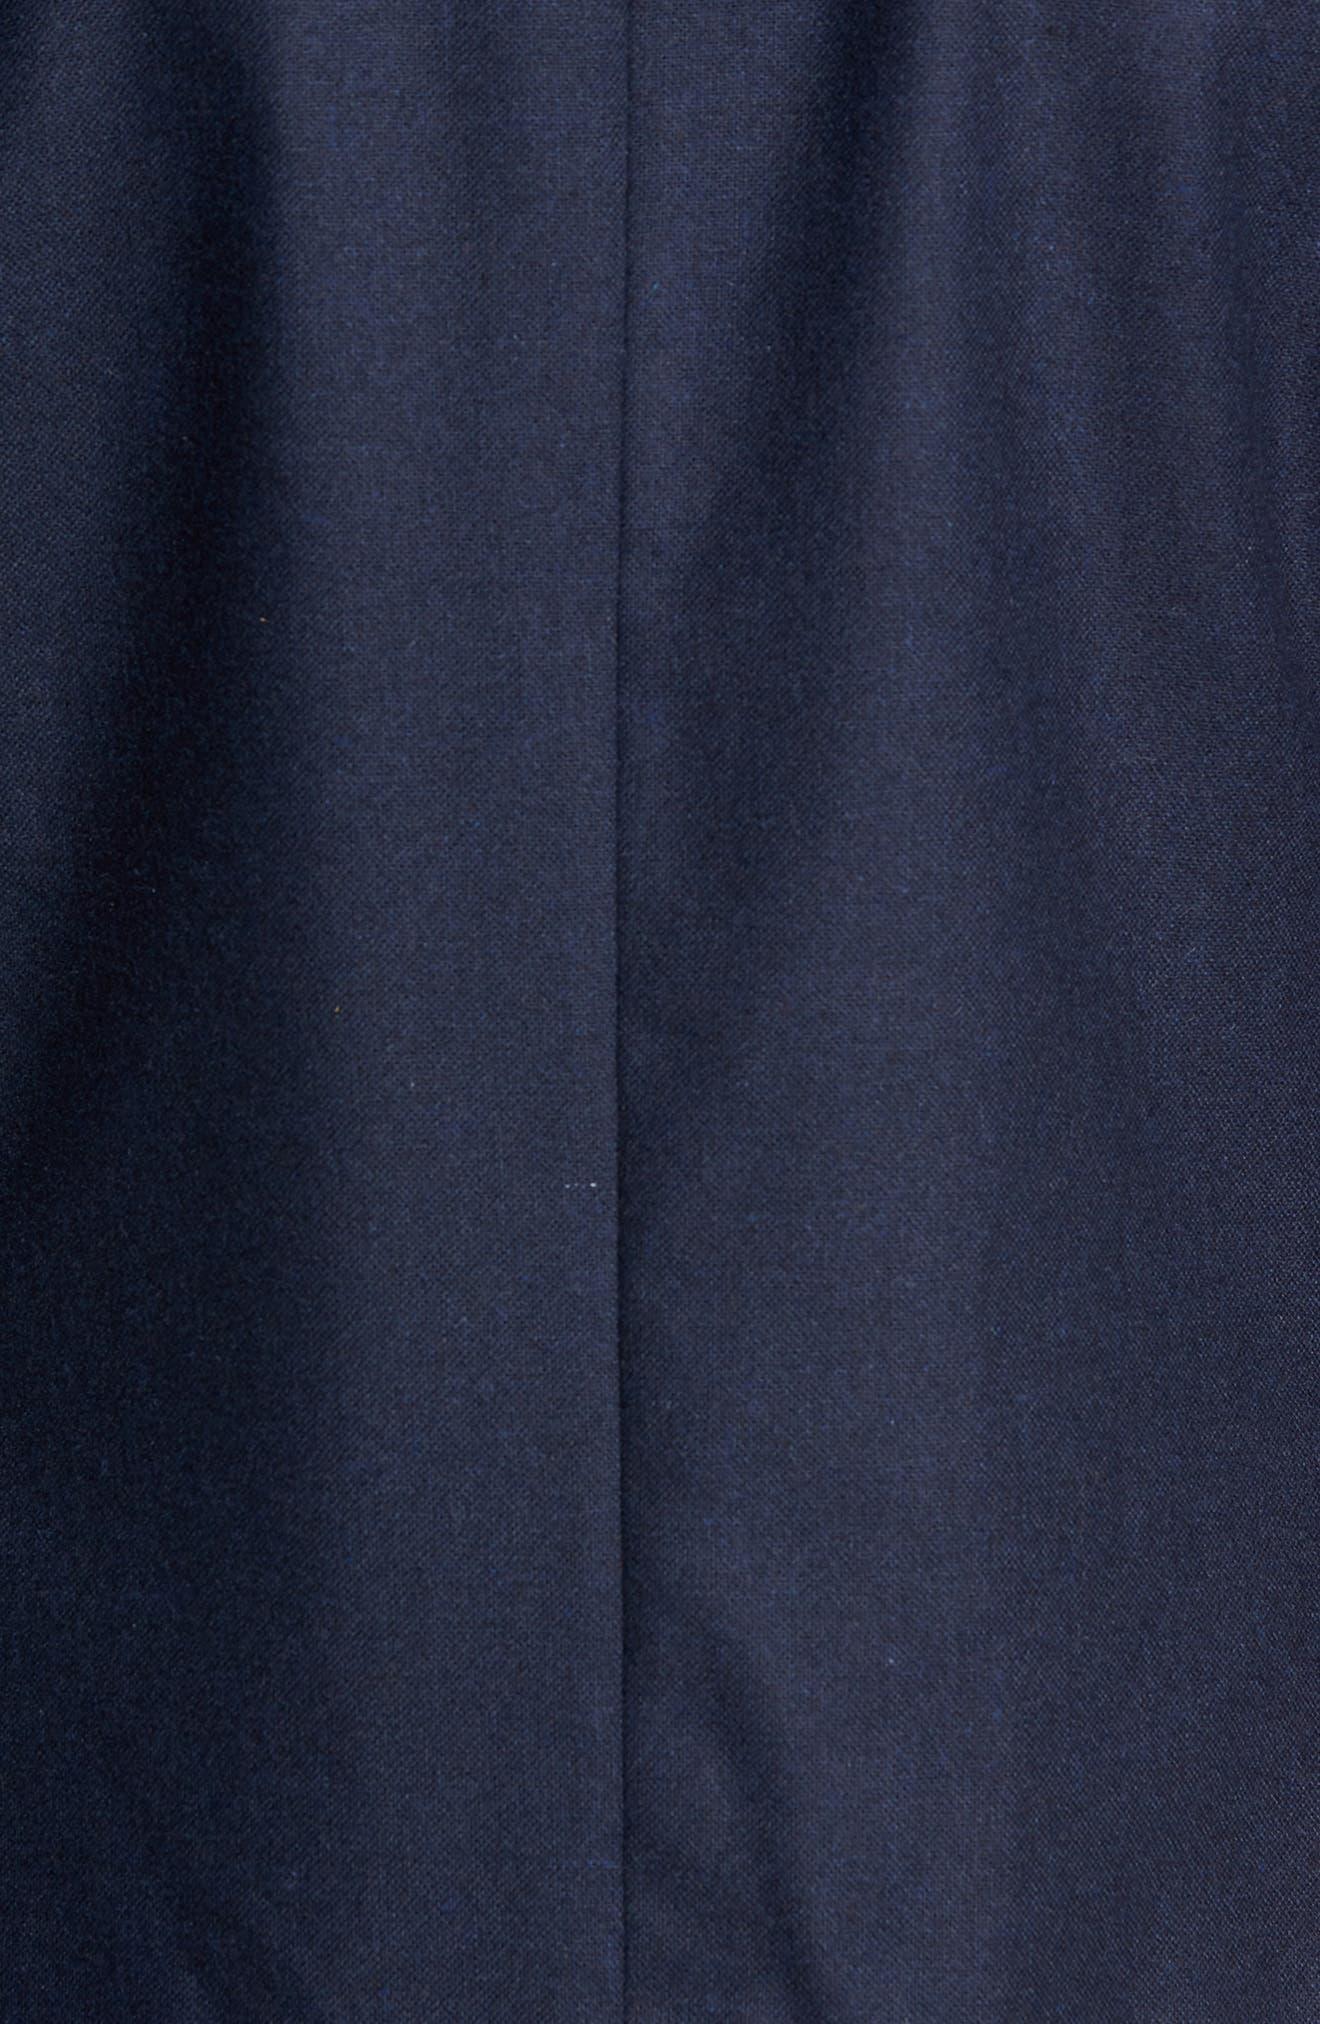 Myloiver Slim Fit Wool Blend Blazer,                             Alternate thumbnail 6, color,                             DARK NAVY